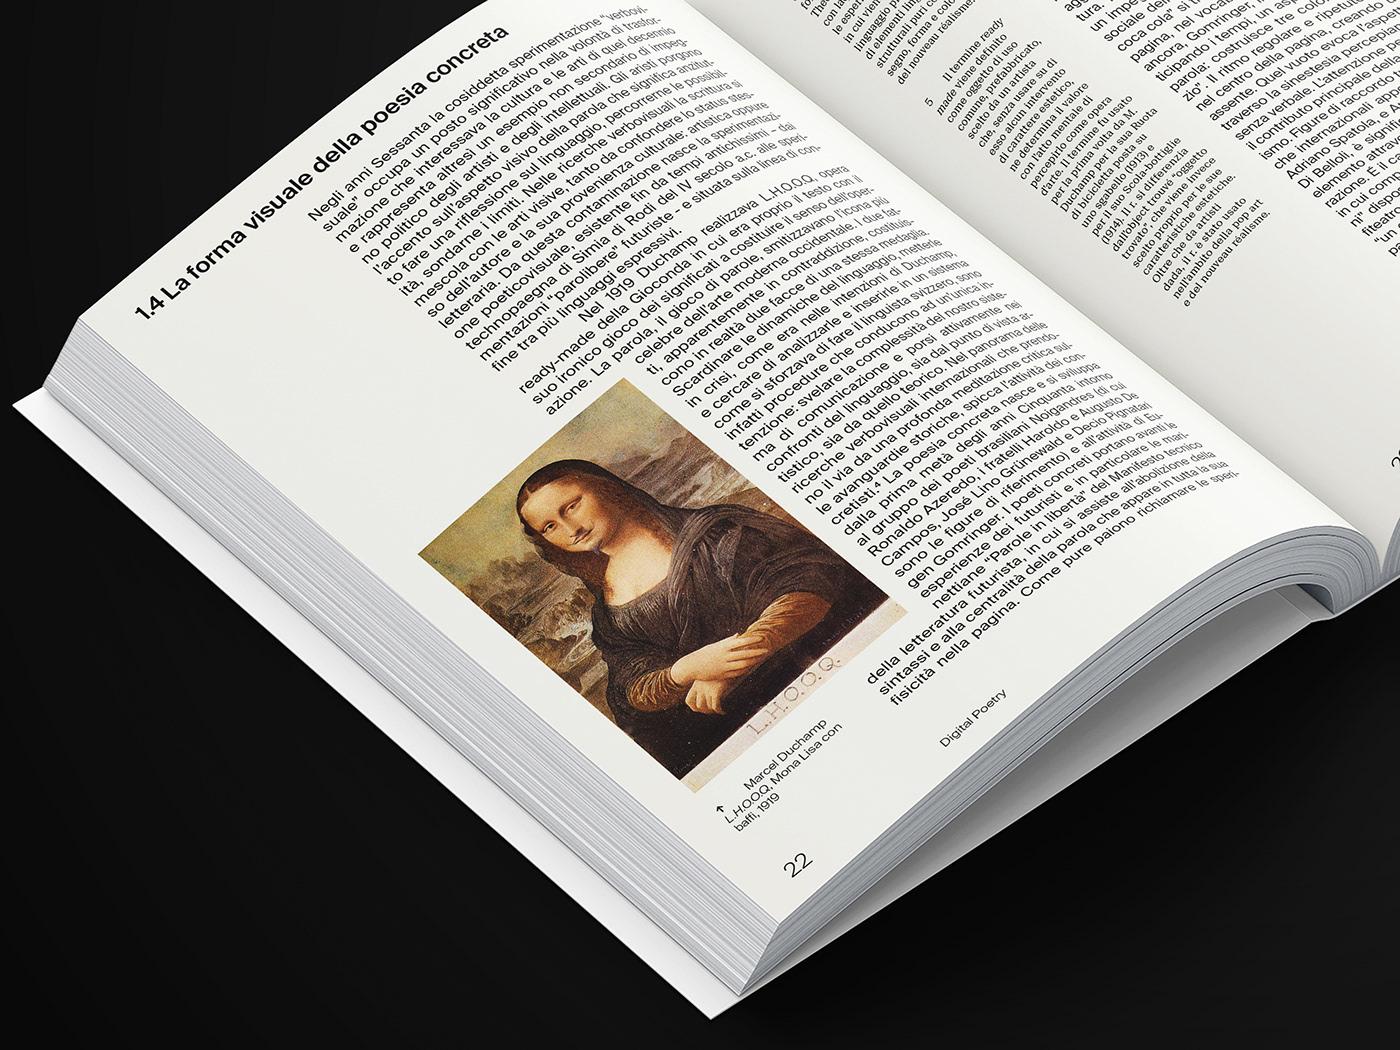 Image may contain: book, human face and print